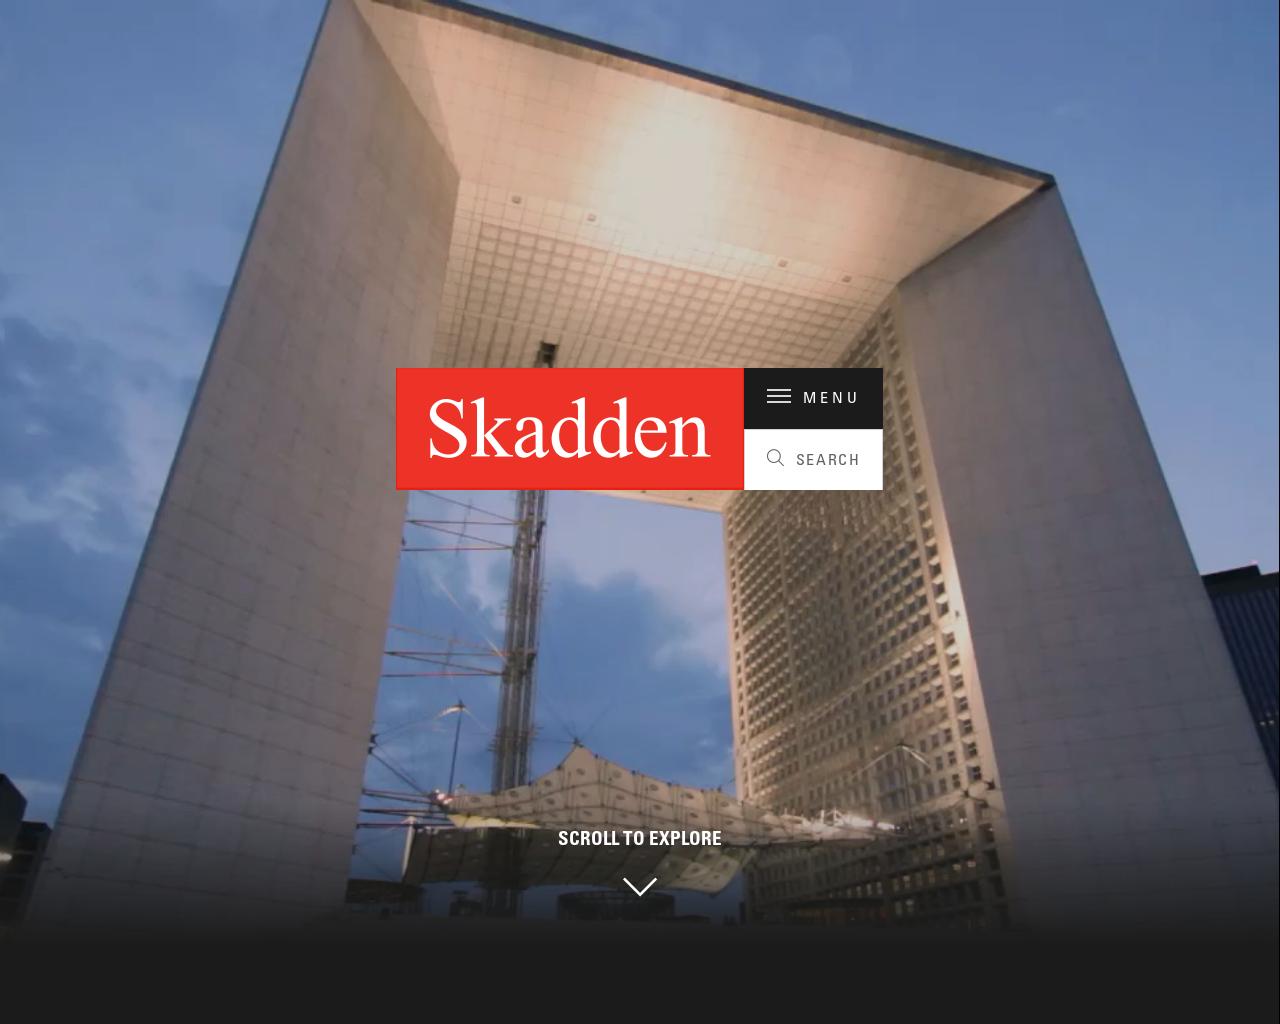 www.skadden.com(2018/05/04 03:30:43)